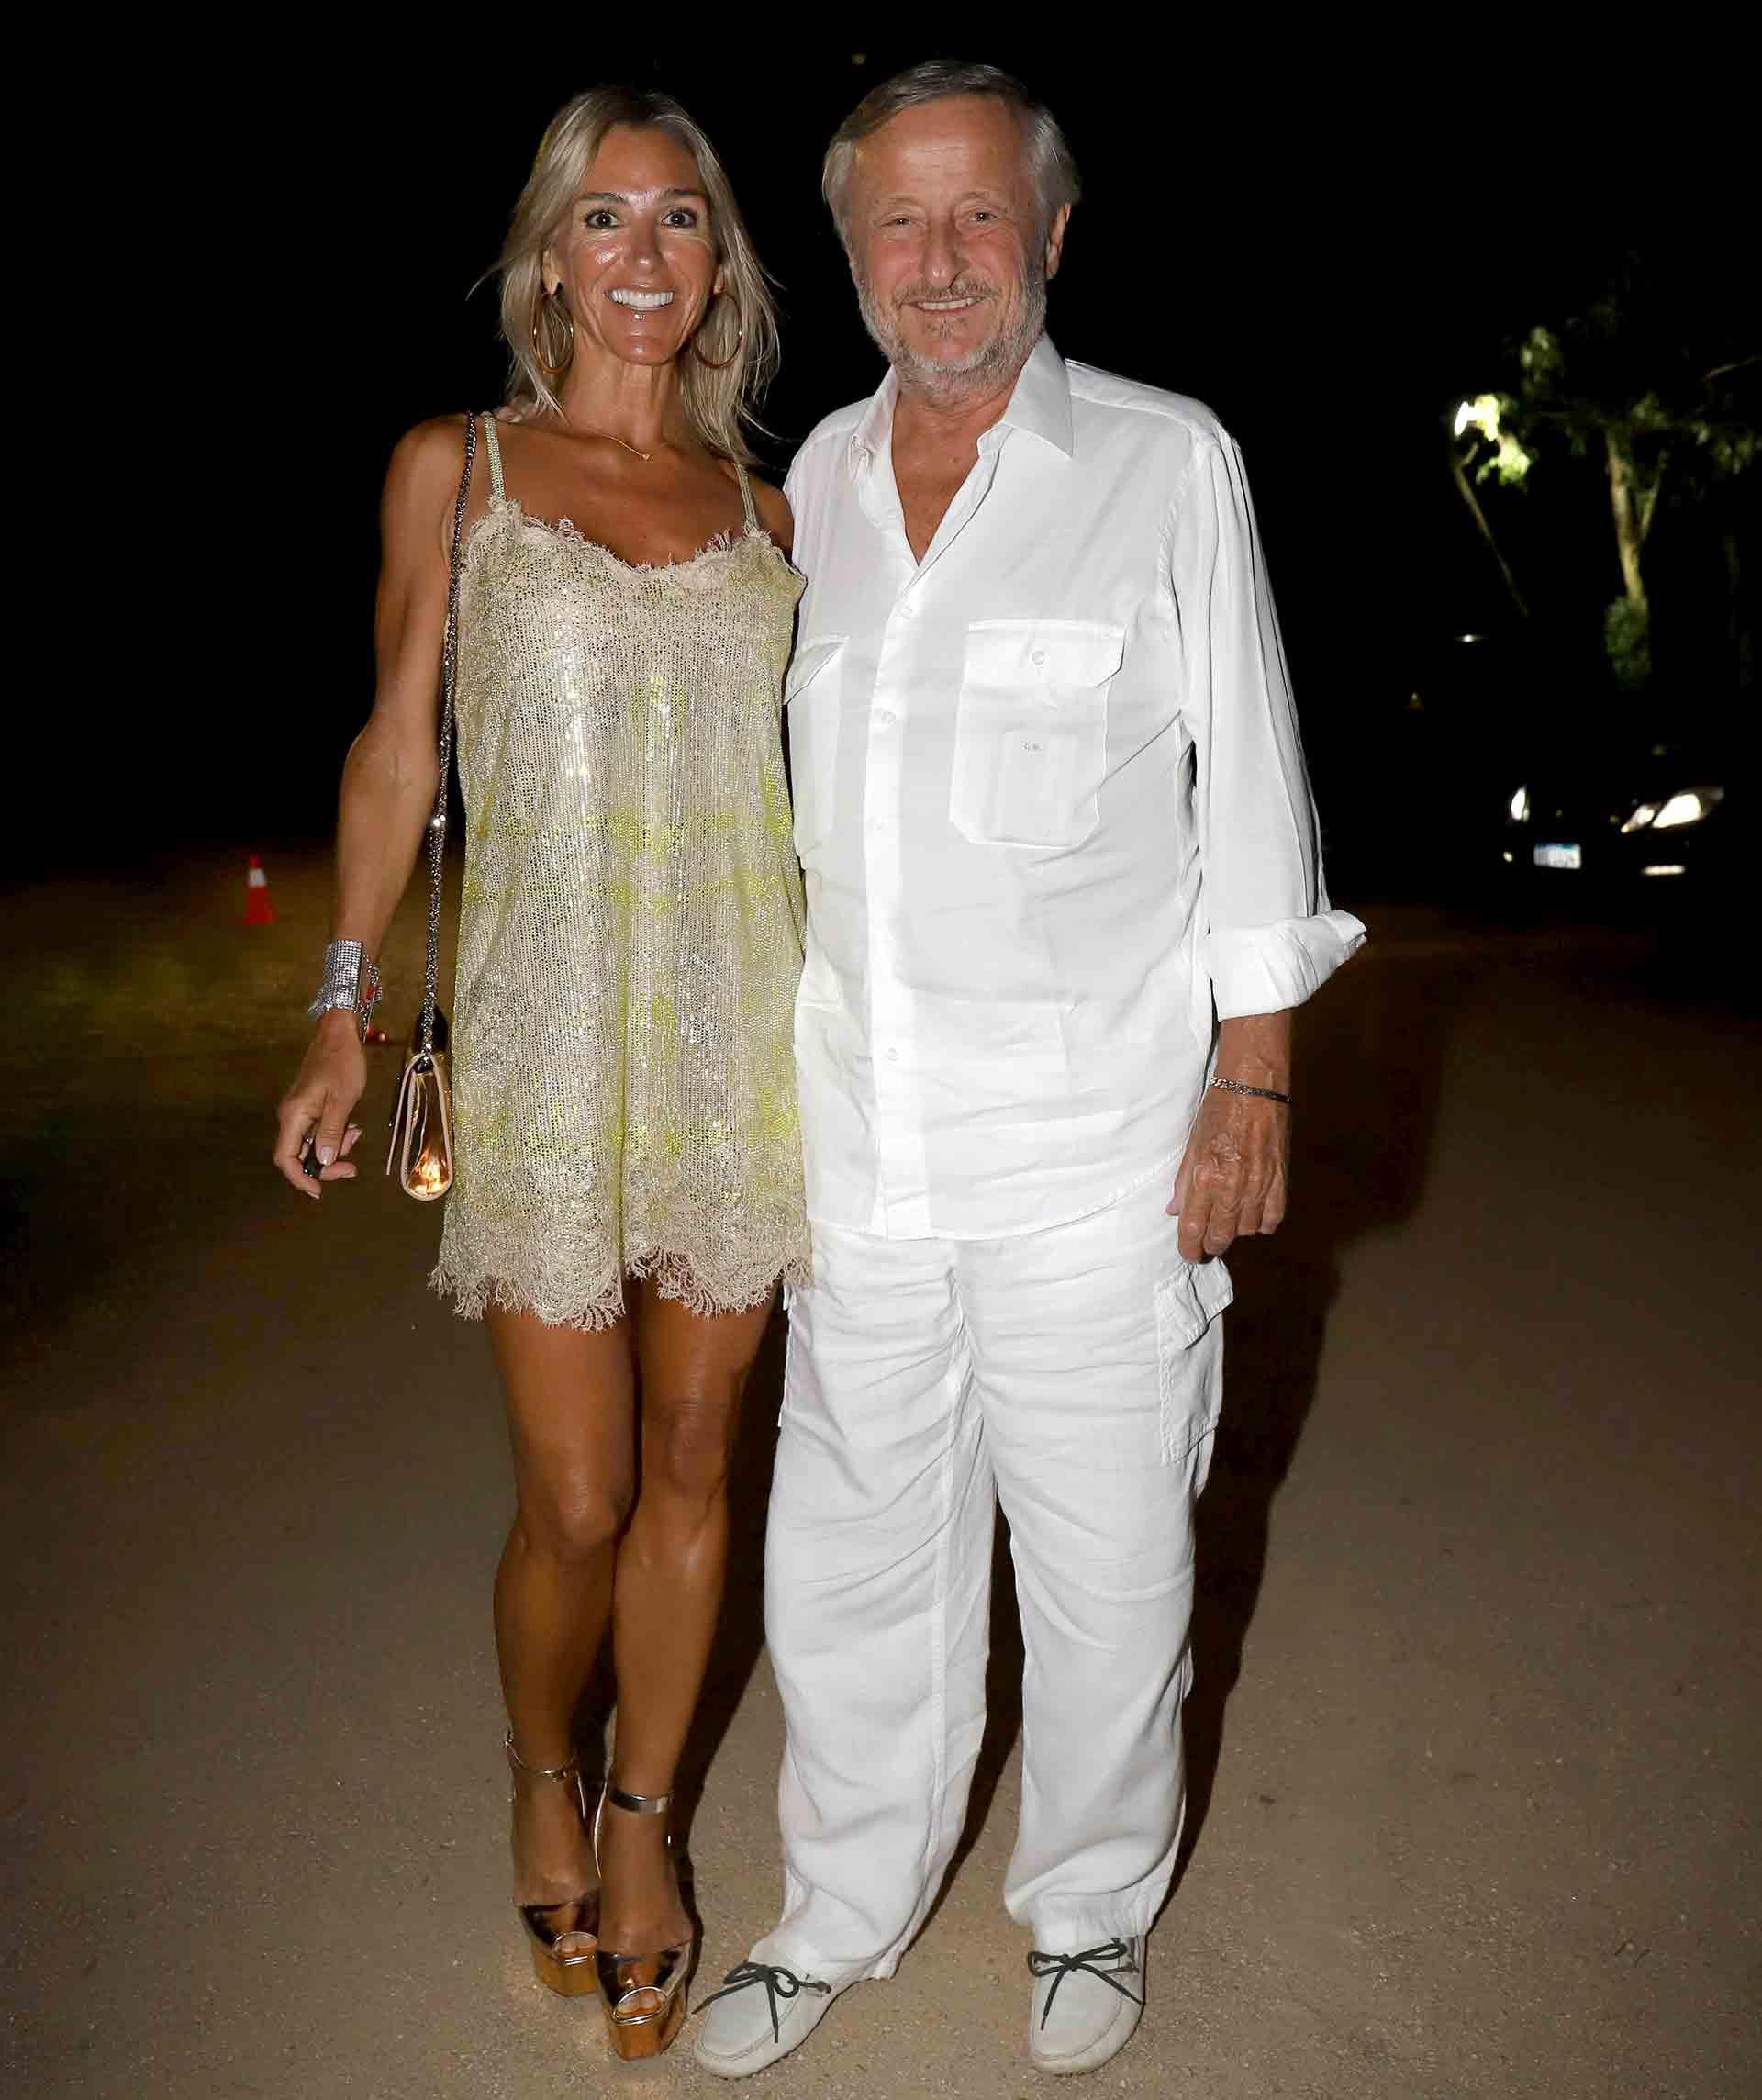 Gabriela Castellani y Cristiano Rattazzi a su llegada a la gran fiesta de Giuseppe Cipriani en Punta del Este